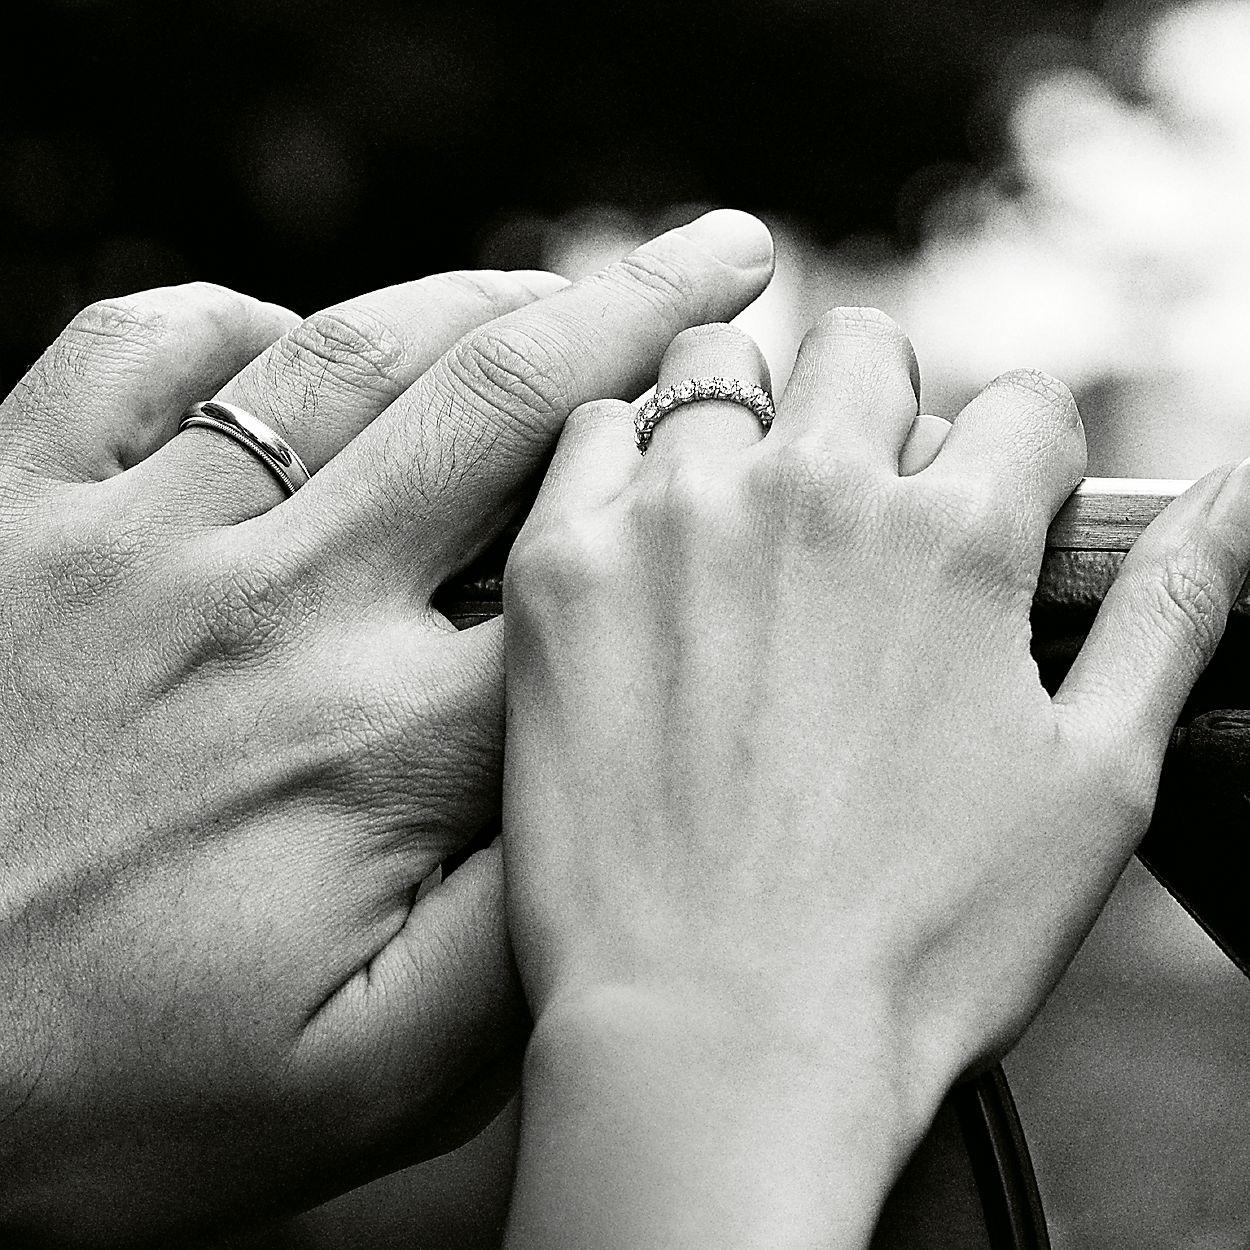 11deca851 Tiffany Classic™ milgrain wedding band ring in platinum, 3 mm wide ...